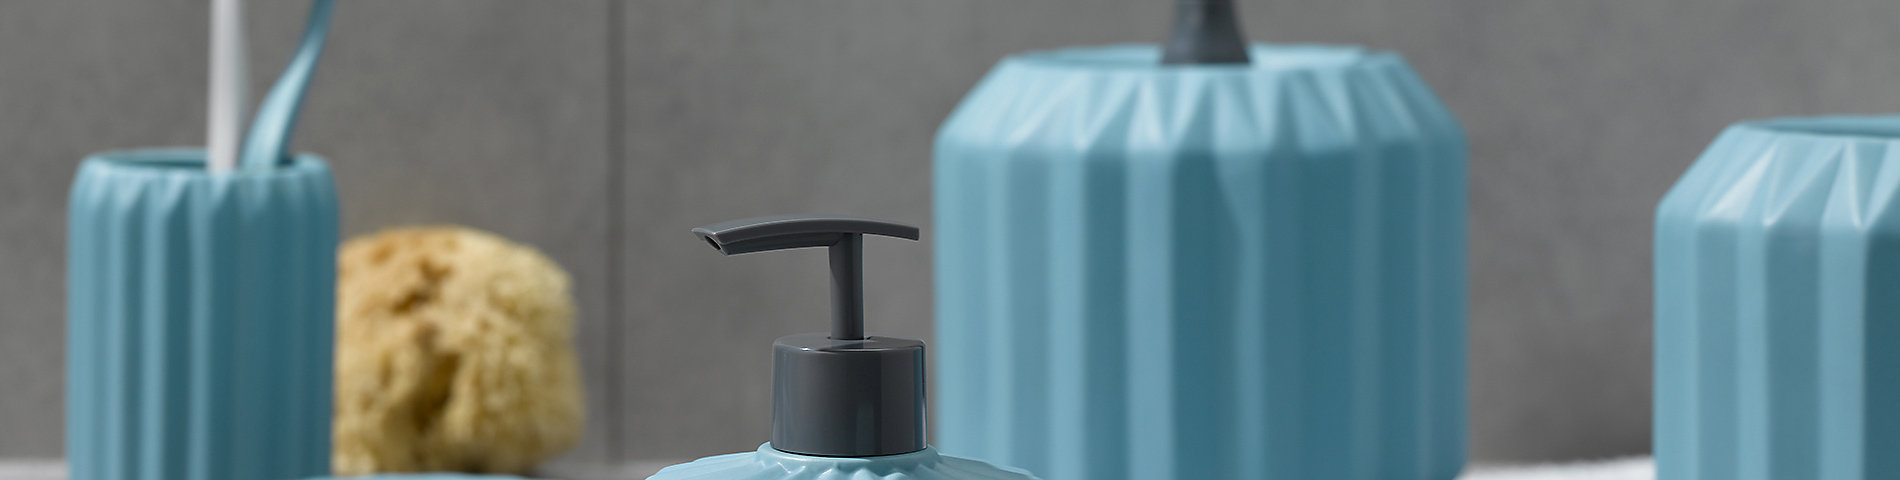 Zahnputzbecher, Zahnbürstenhalter aus Edelstahl & Kunststoff | Kela